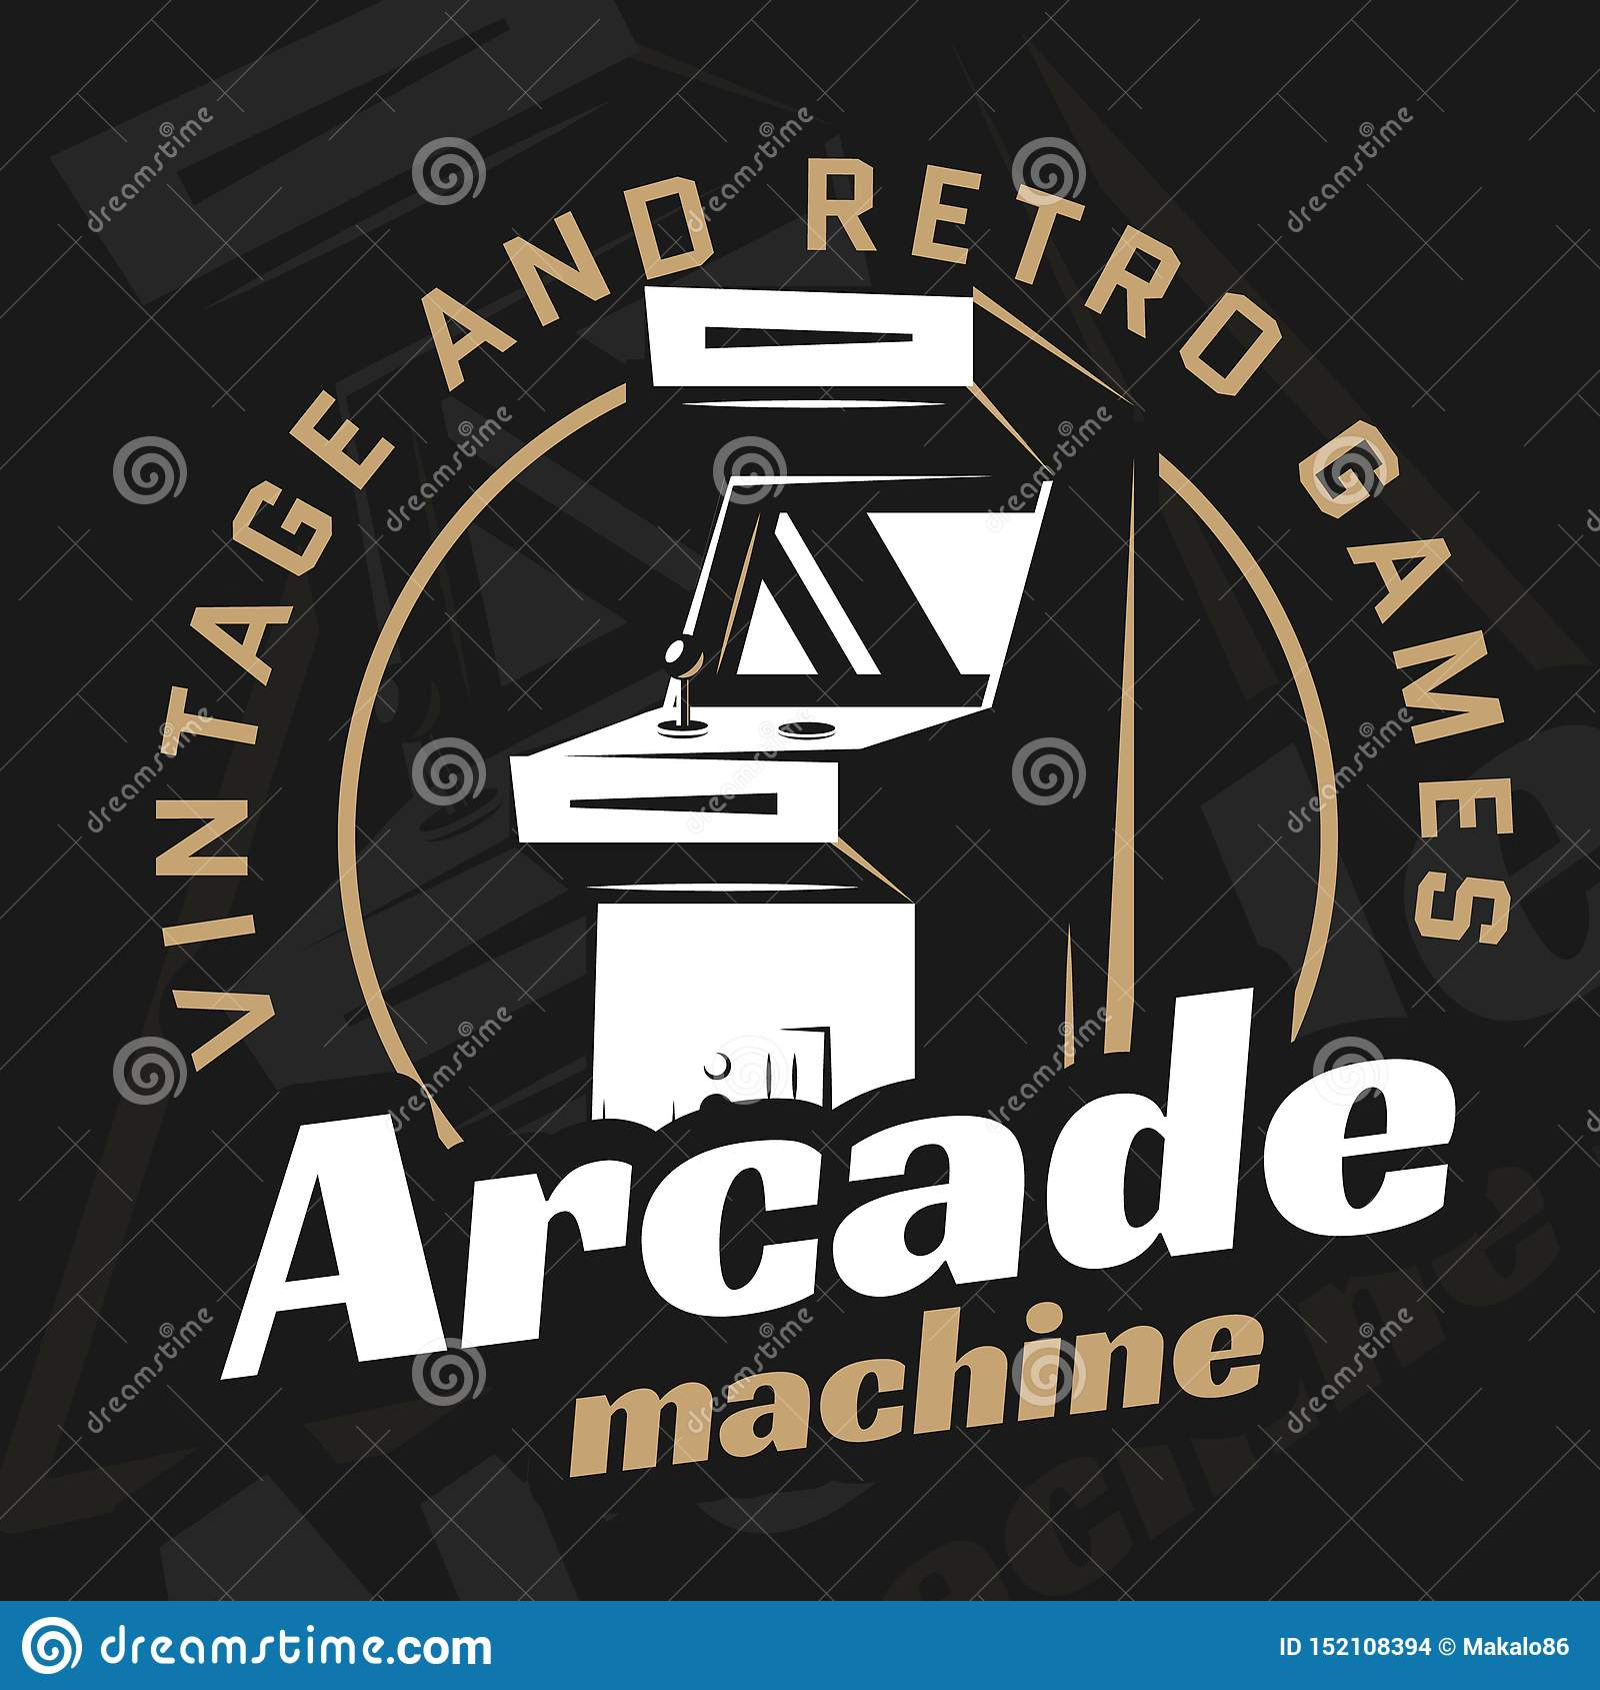 Arcade Machine Vector Stock Vector Illustration Of Computer 152108394